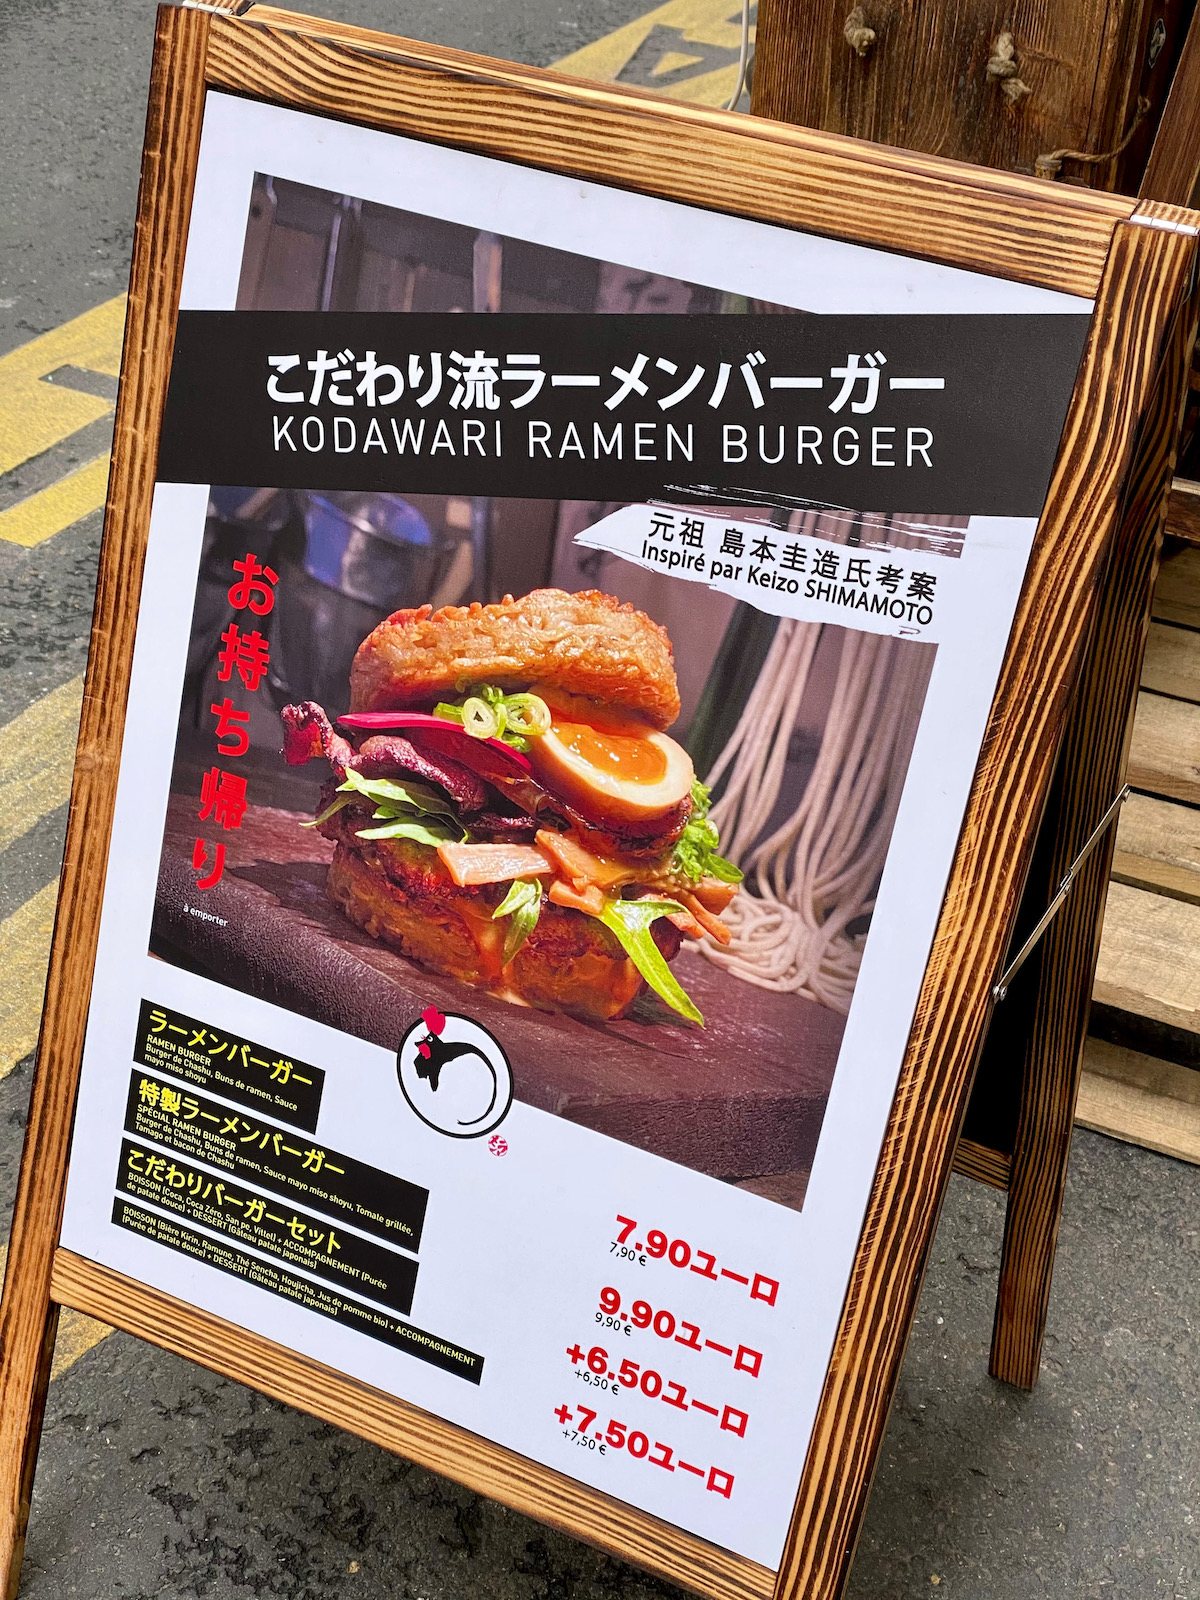 kodawari ramen burger paris